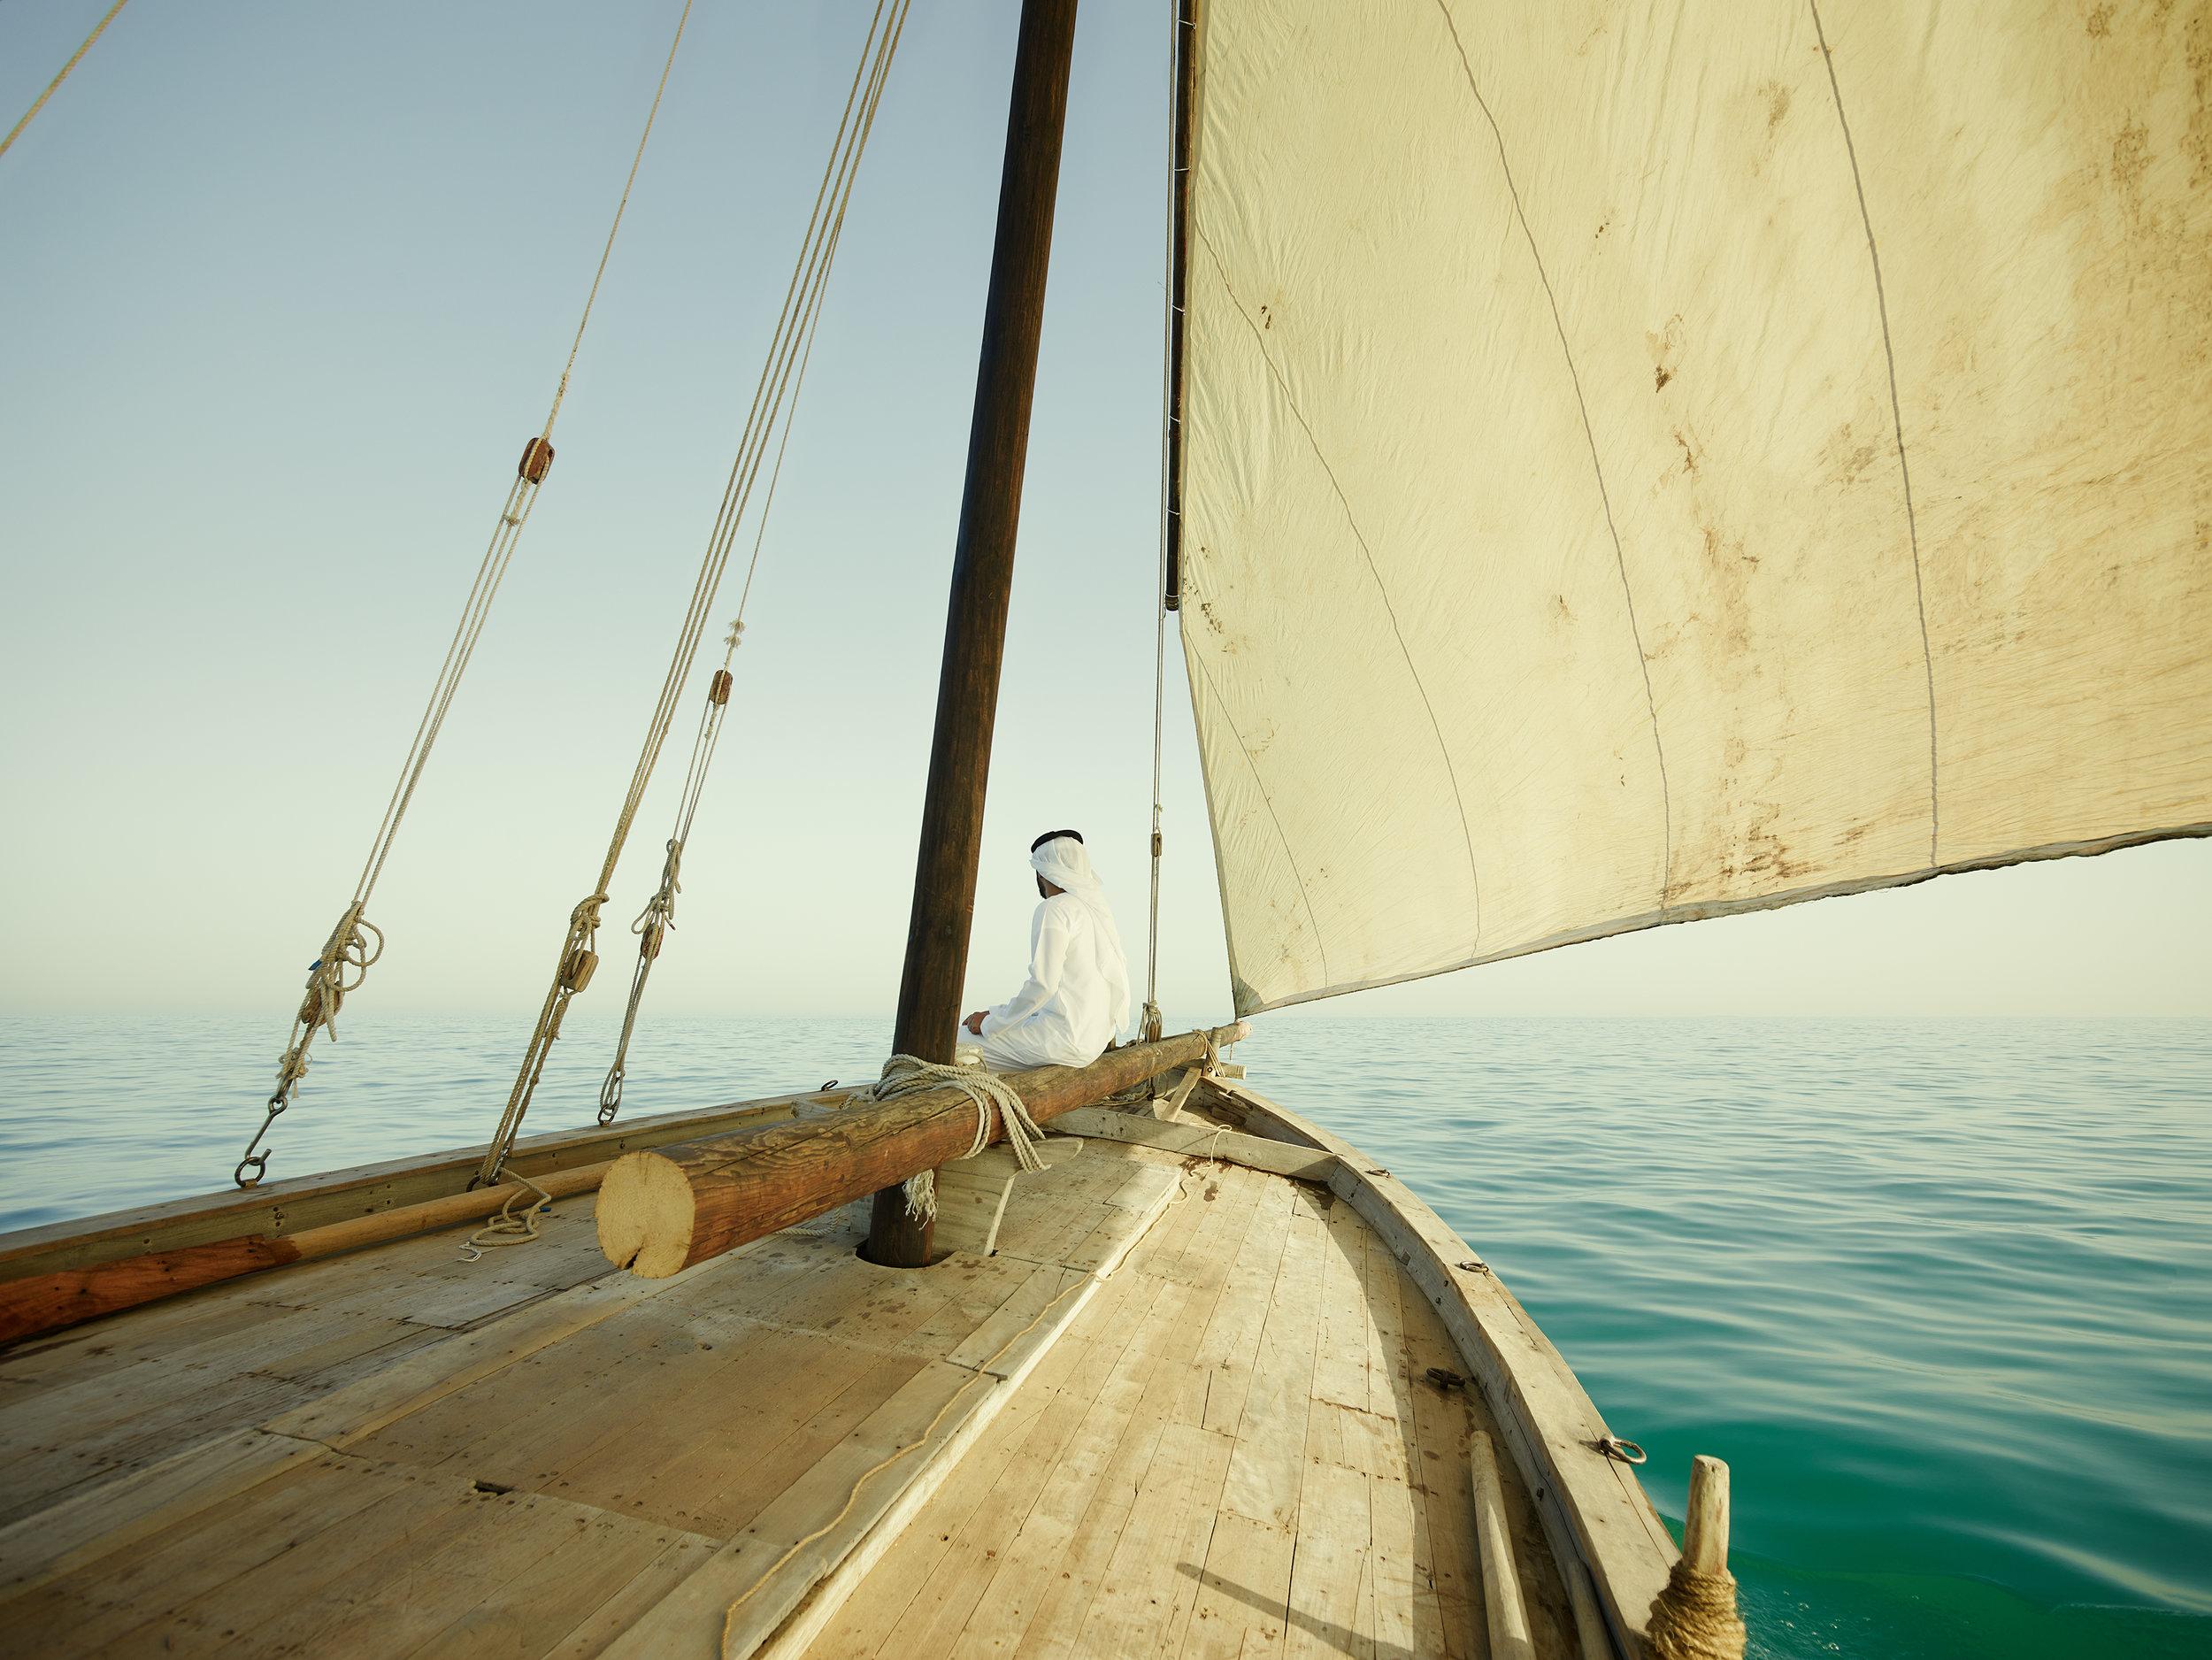 AbuDhabi_Day1_Boat_0368_FinalFlat.jpg